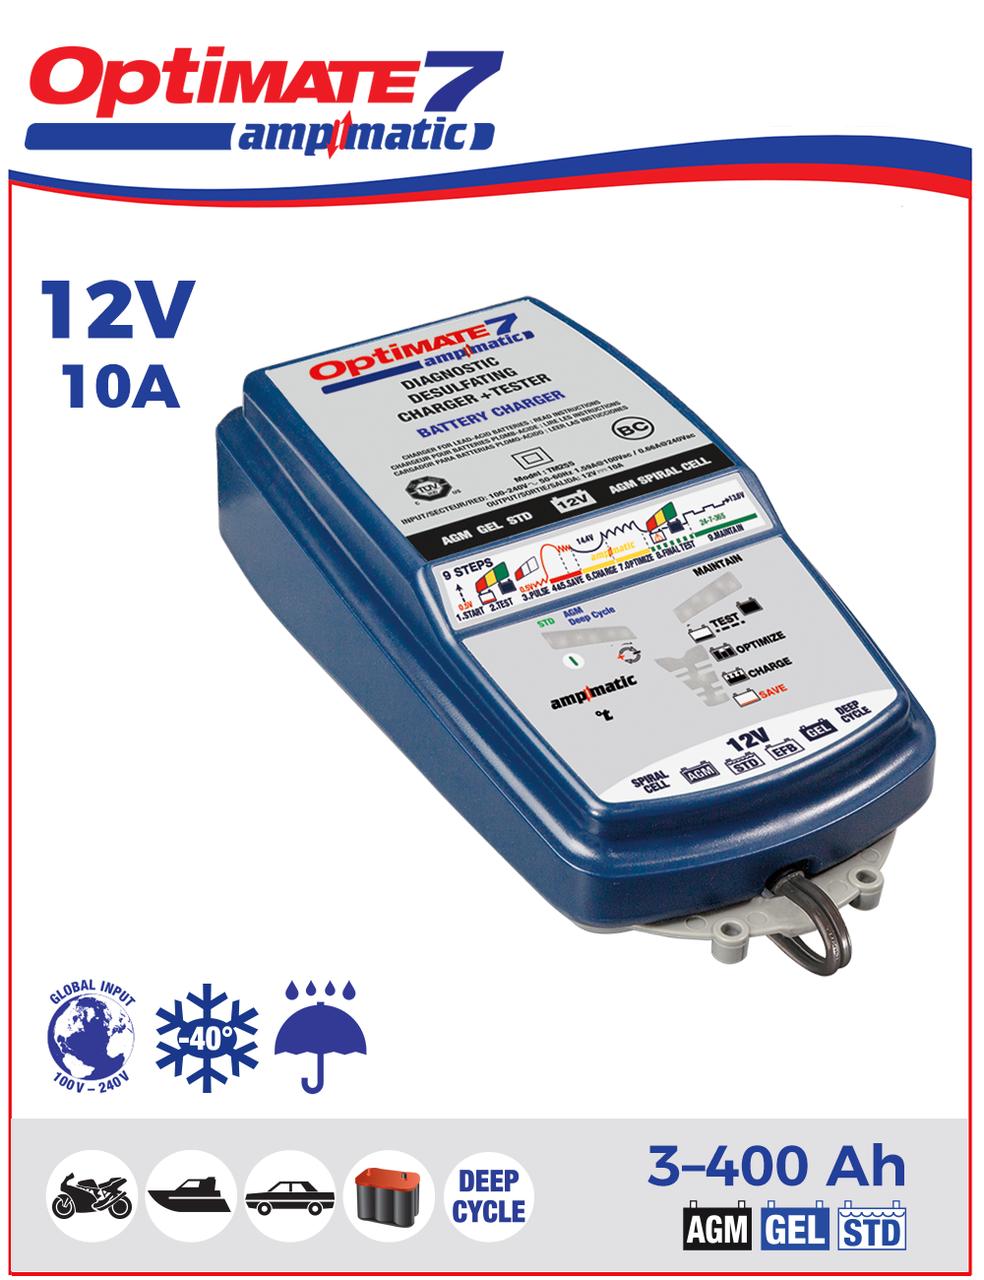 Зарядное устройство Optimate 7 Ampmatic TM254 (1-10А, 12V)